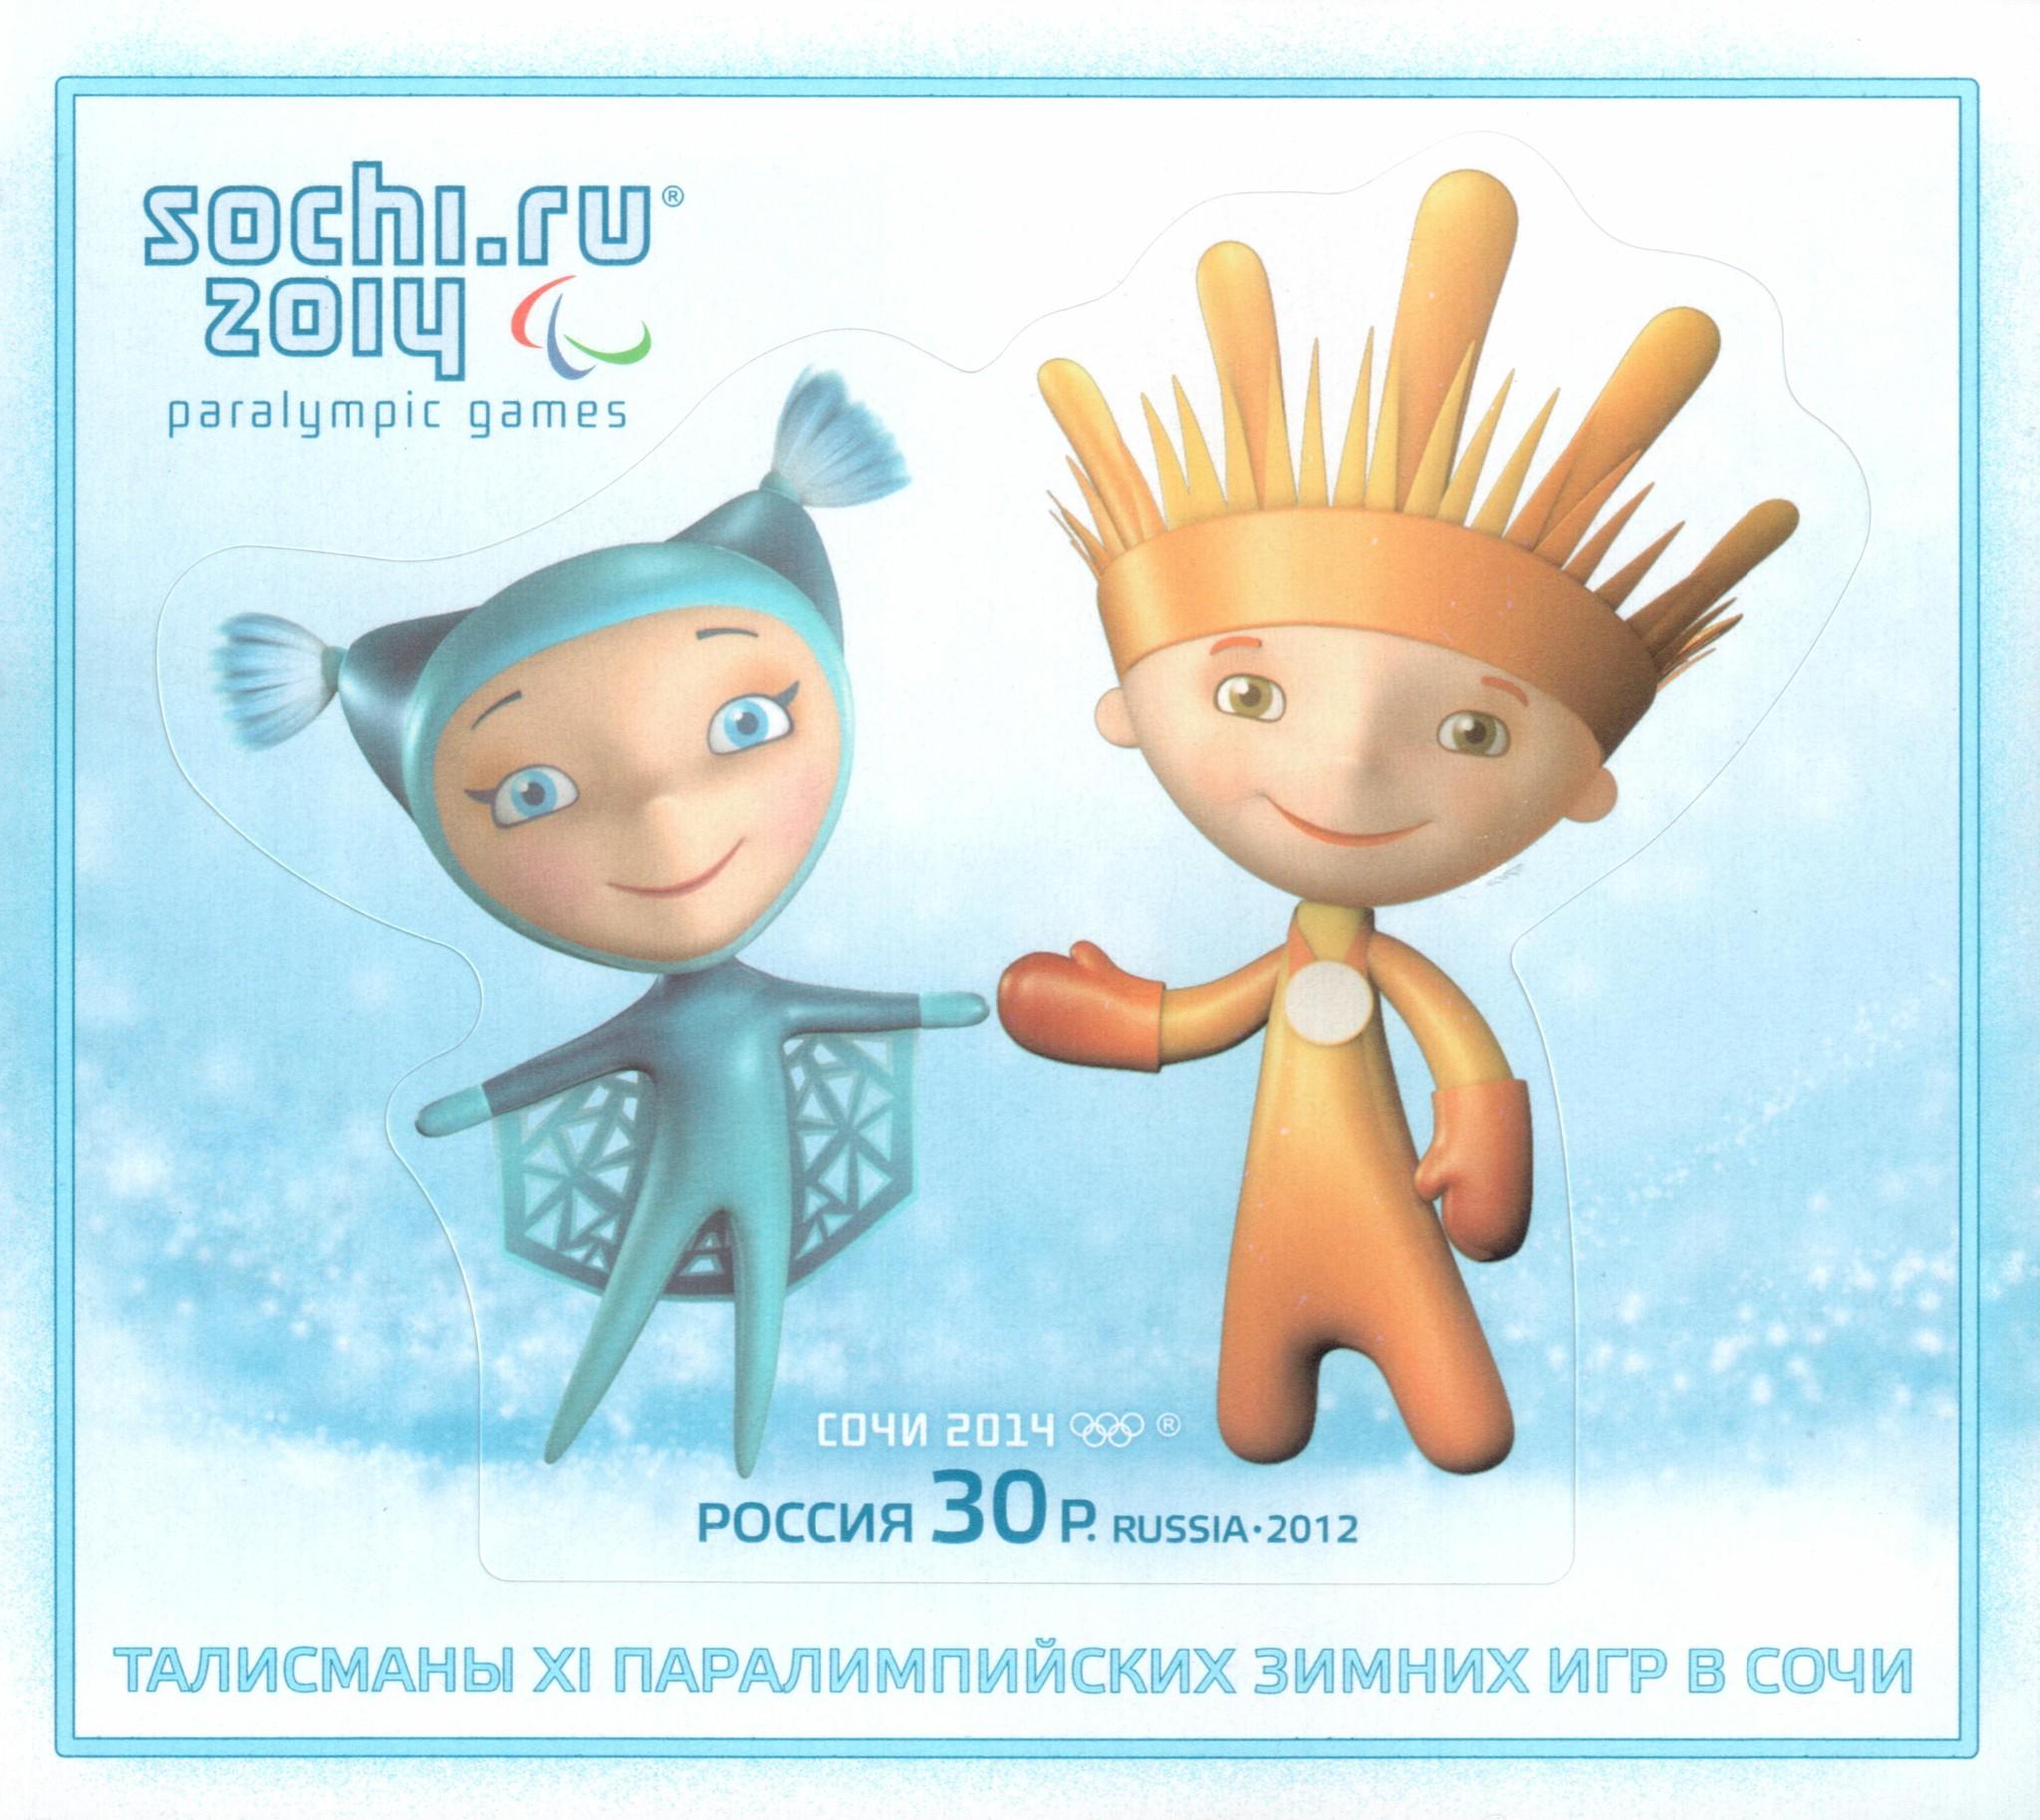 Талисманы XI Паралимпийских зимних игр в Сочи